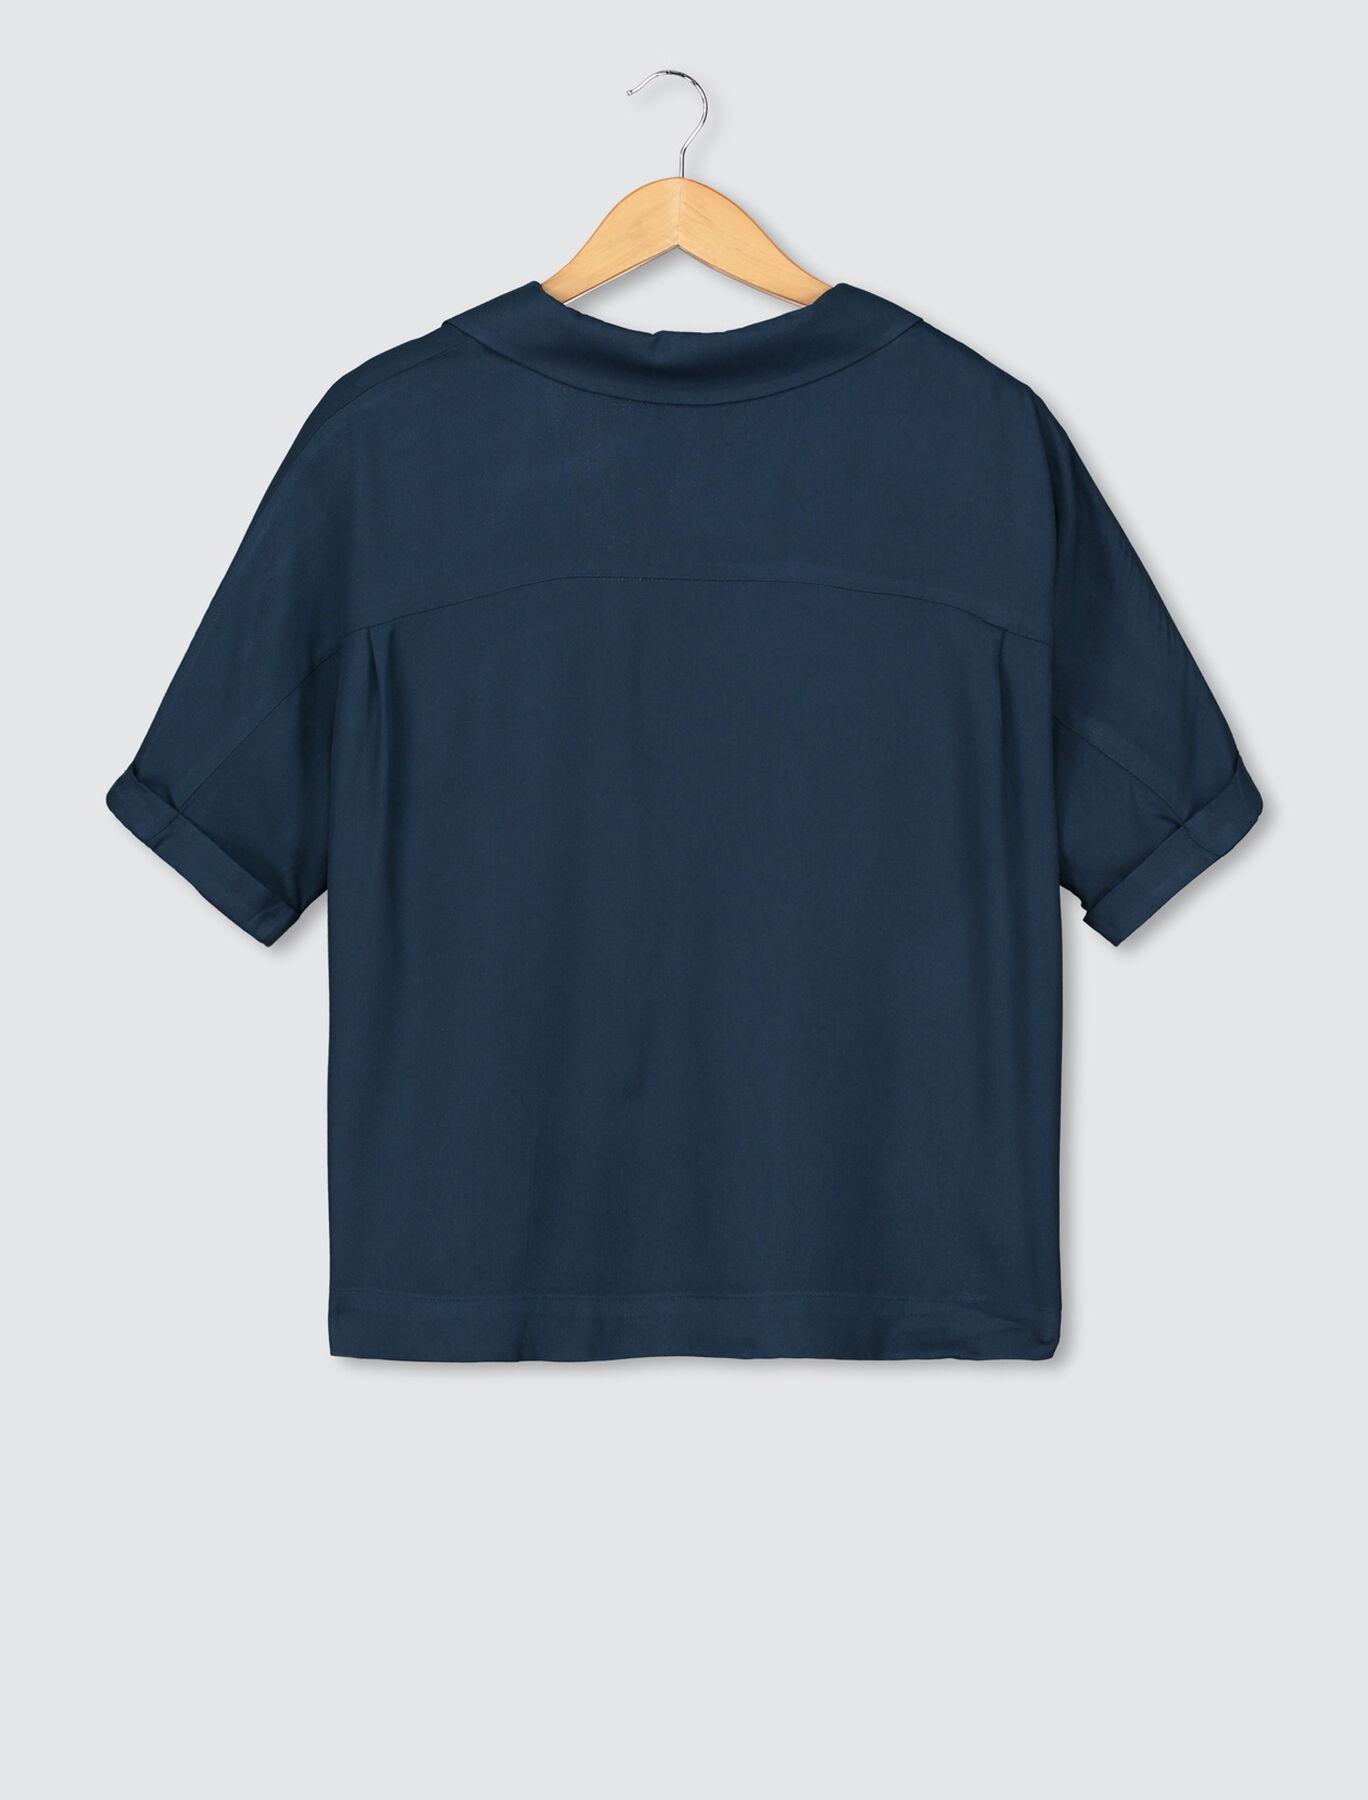 Chemise Unie Boutons Bijoux